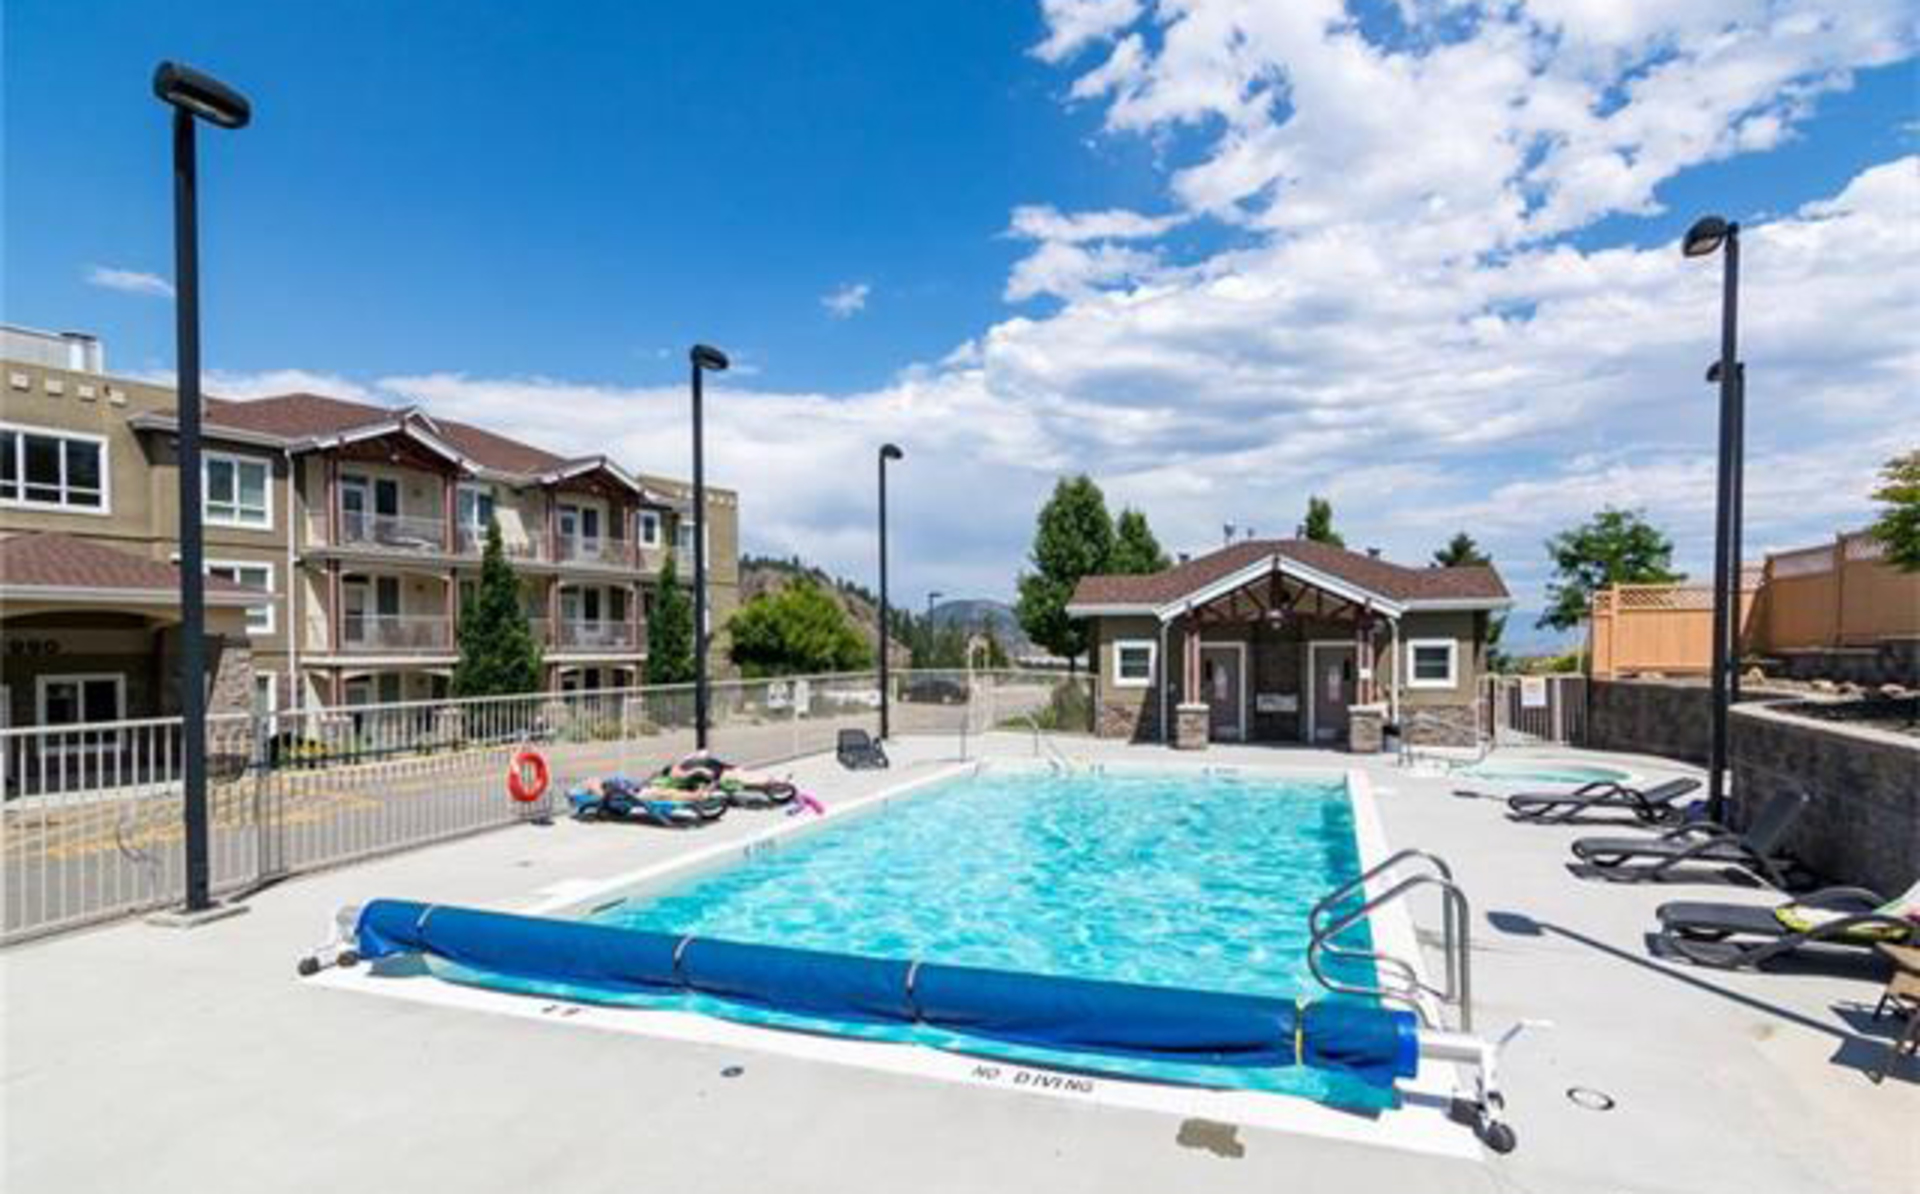 West Kelowna Real Estate at 3317 - 1990 Upper Sundance Drive, West Kelowna, Central Okanagan